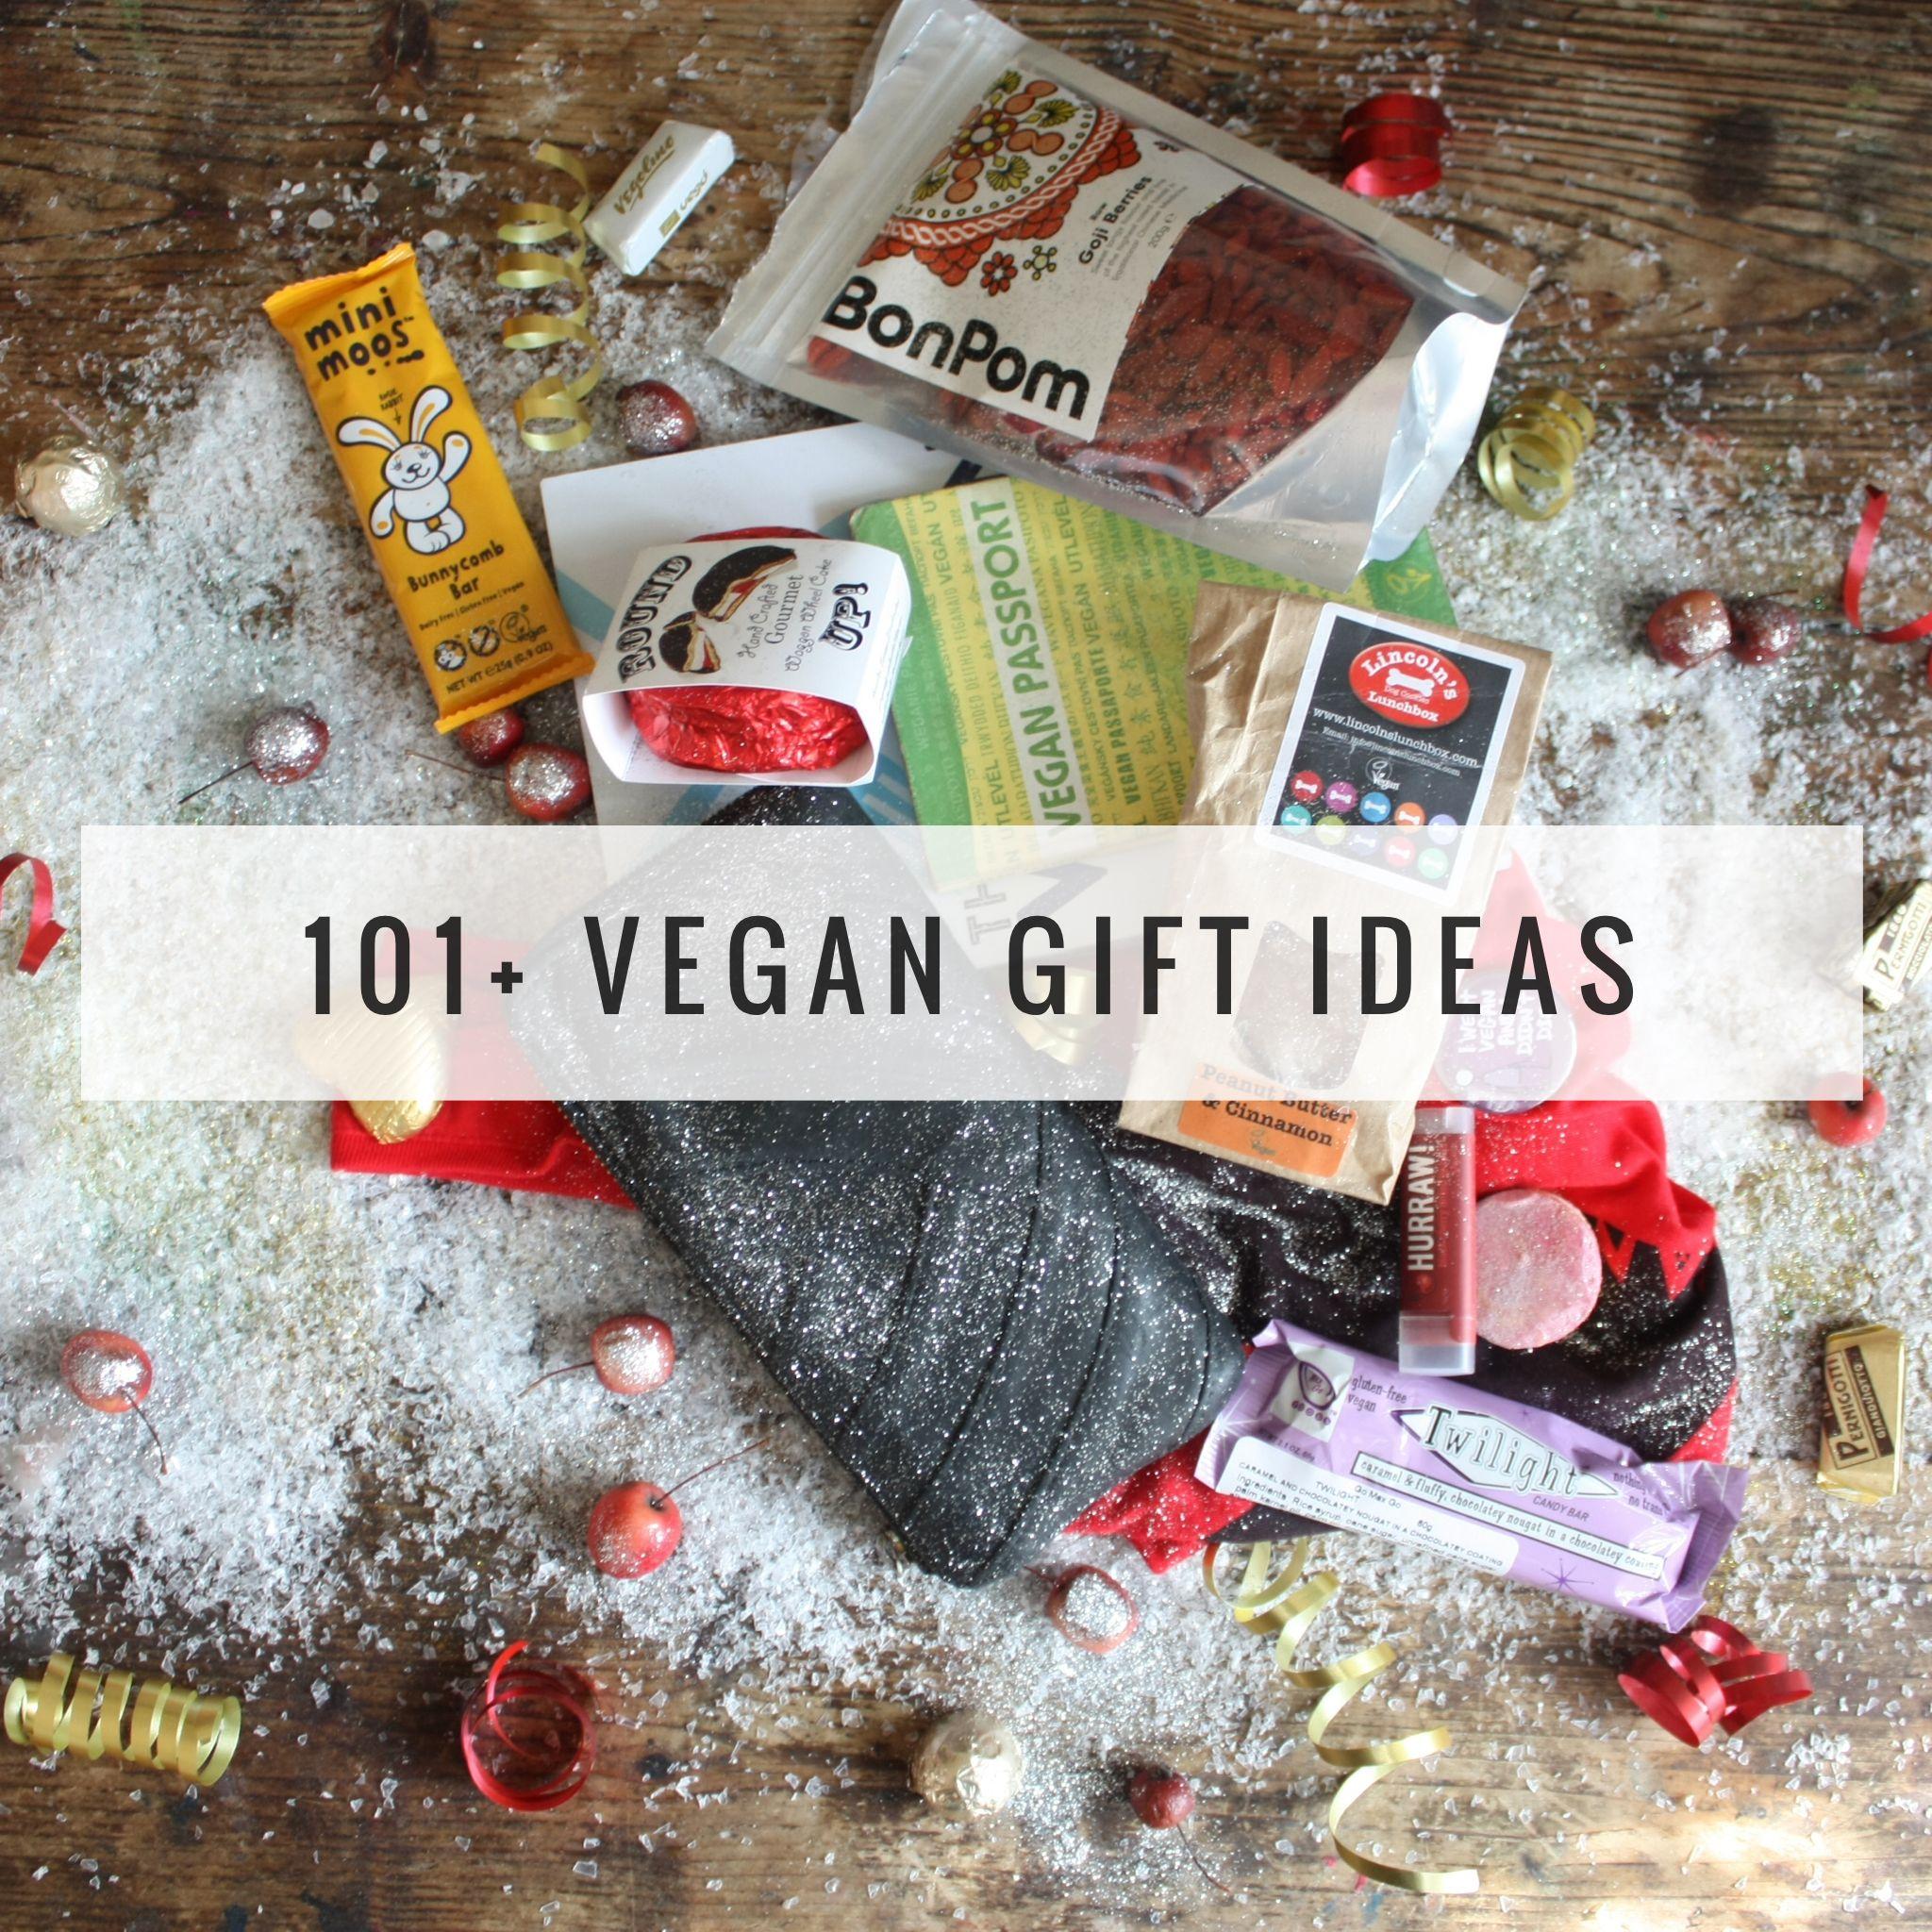 Vegan Vegetarian Gift Ideas For Him Her Family Love Holiday Etc Vegan Gifts Vegan Christmas Gifts Vegan Food Gifts